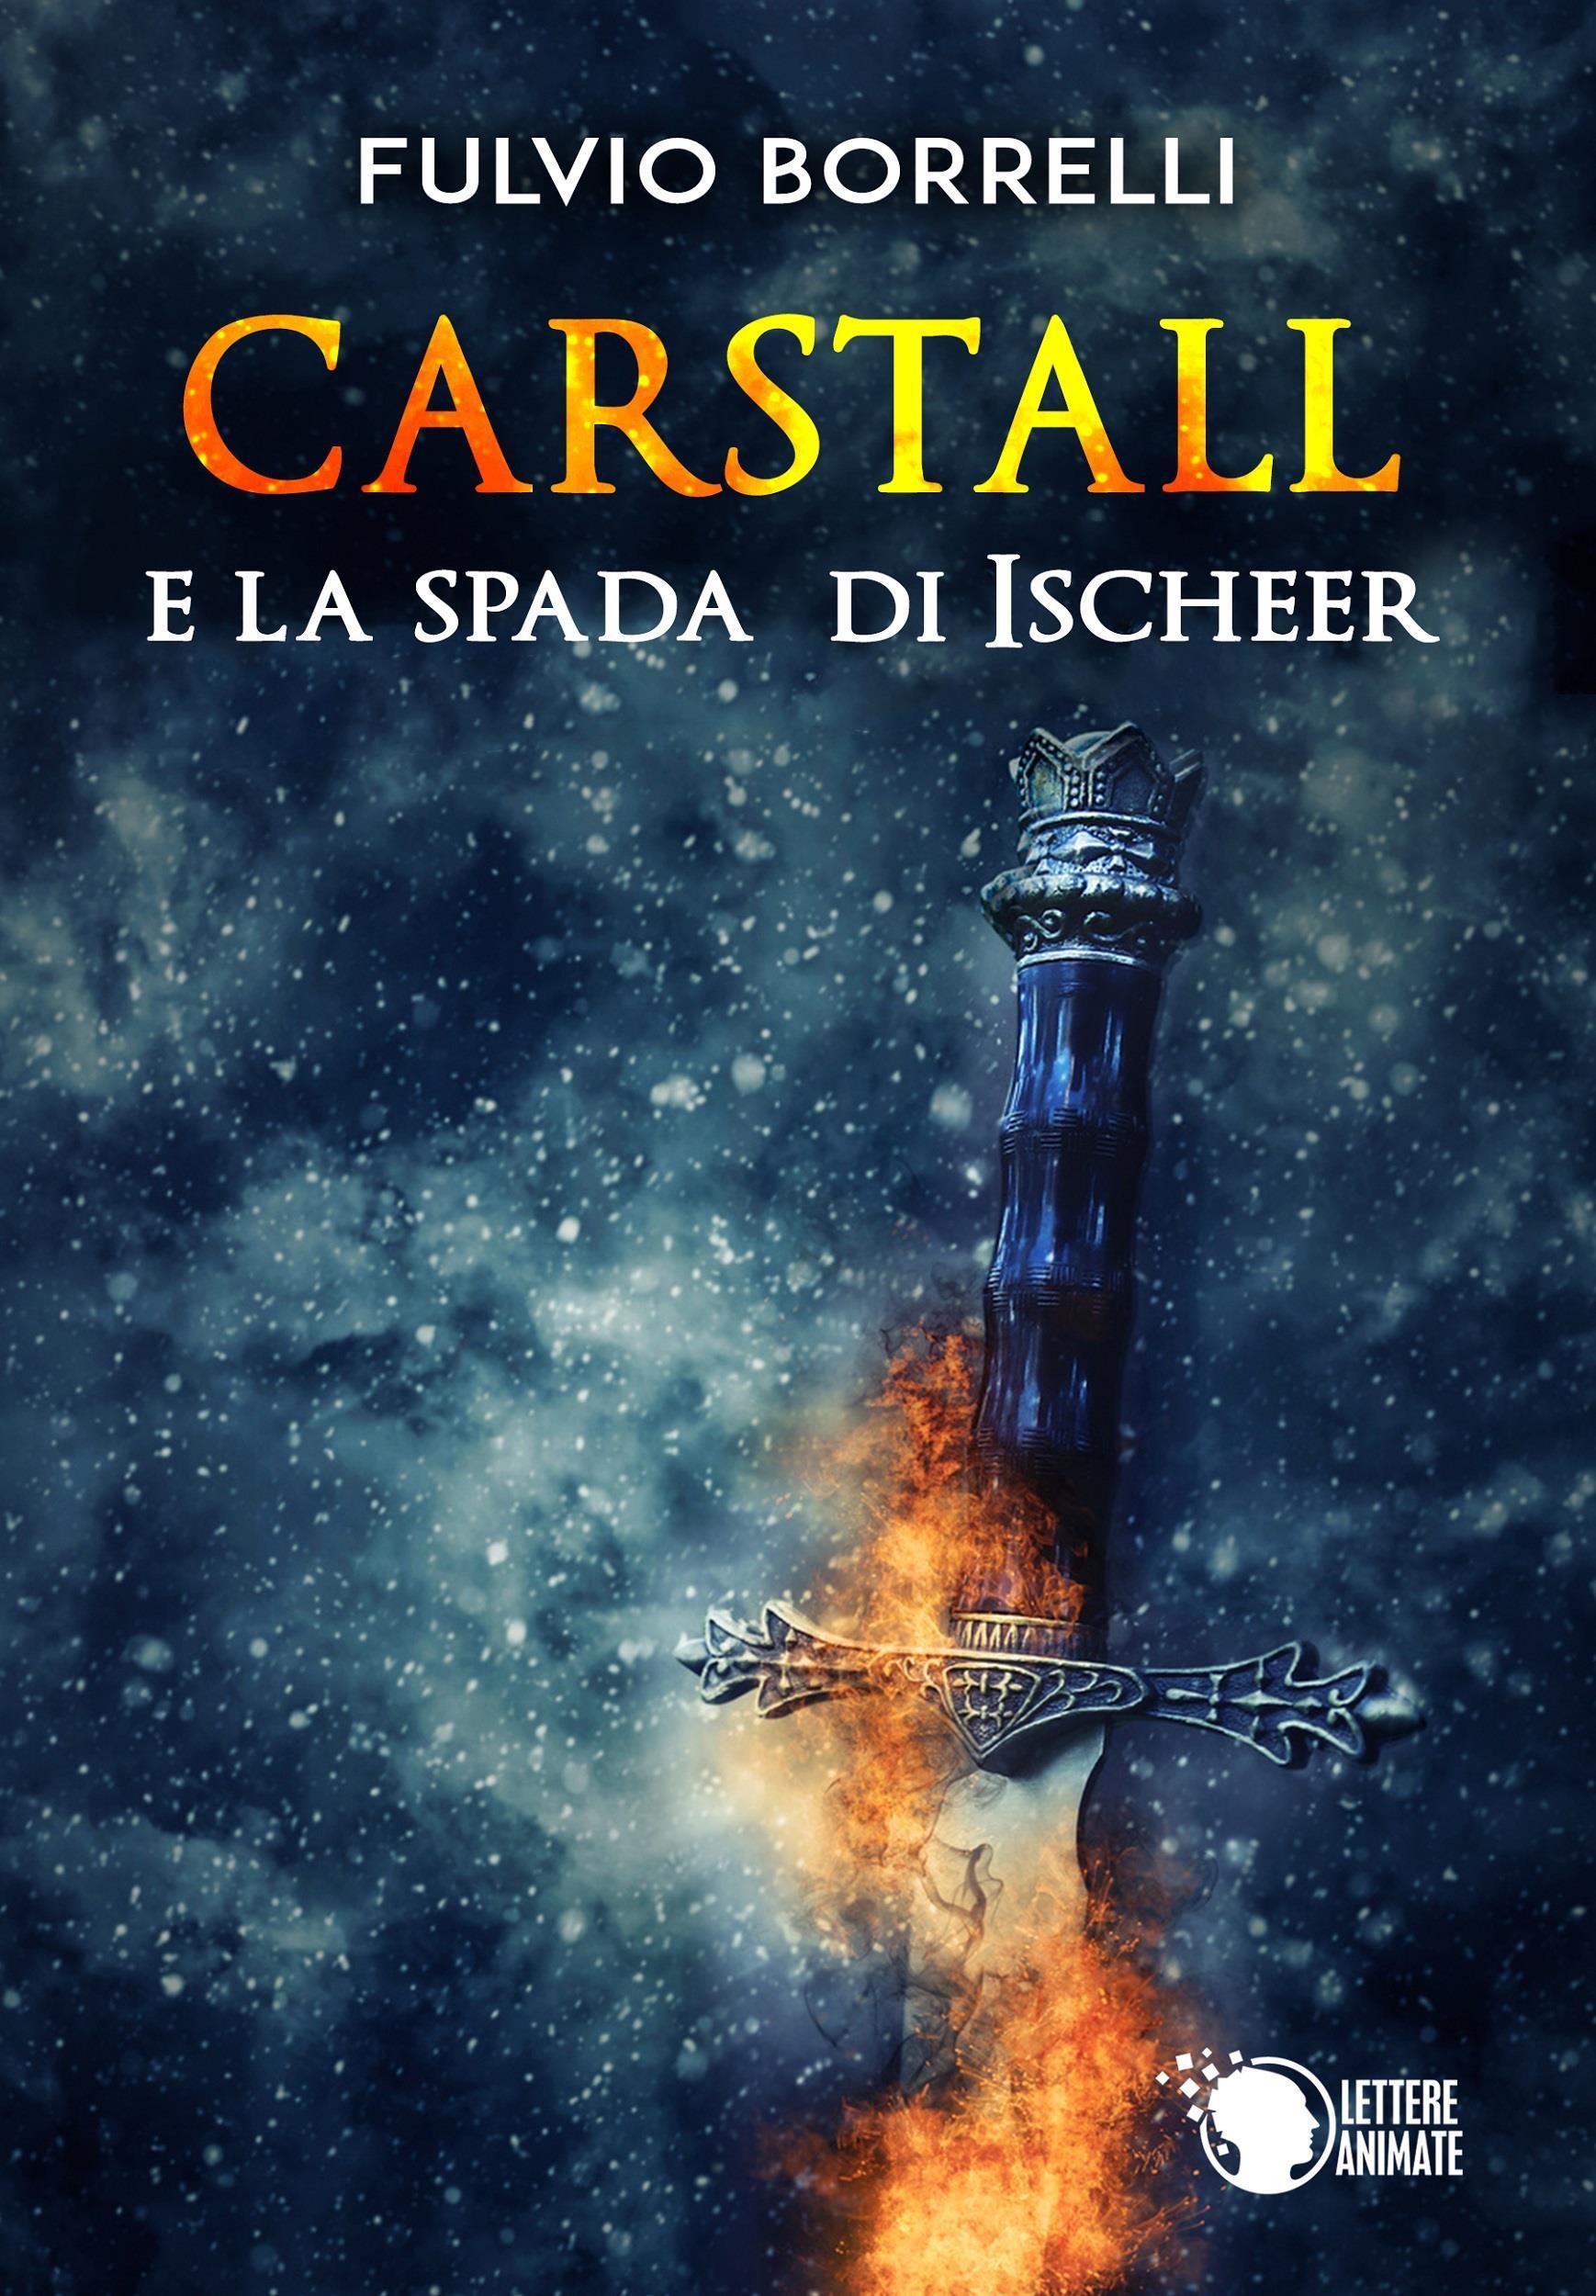 Carstall e la Spada di Ischeer